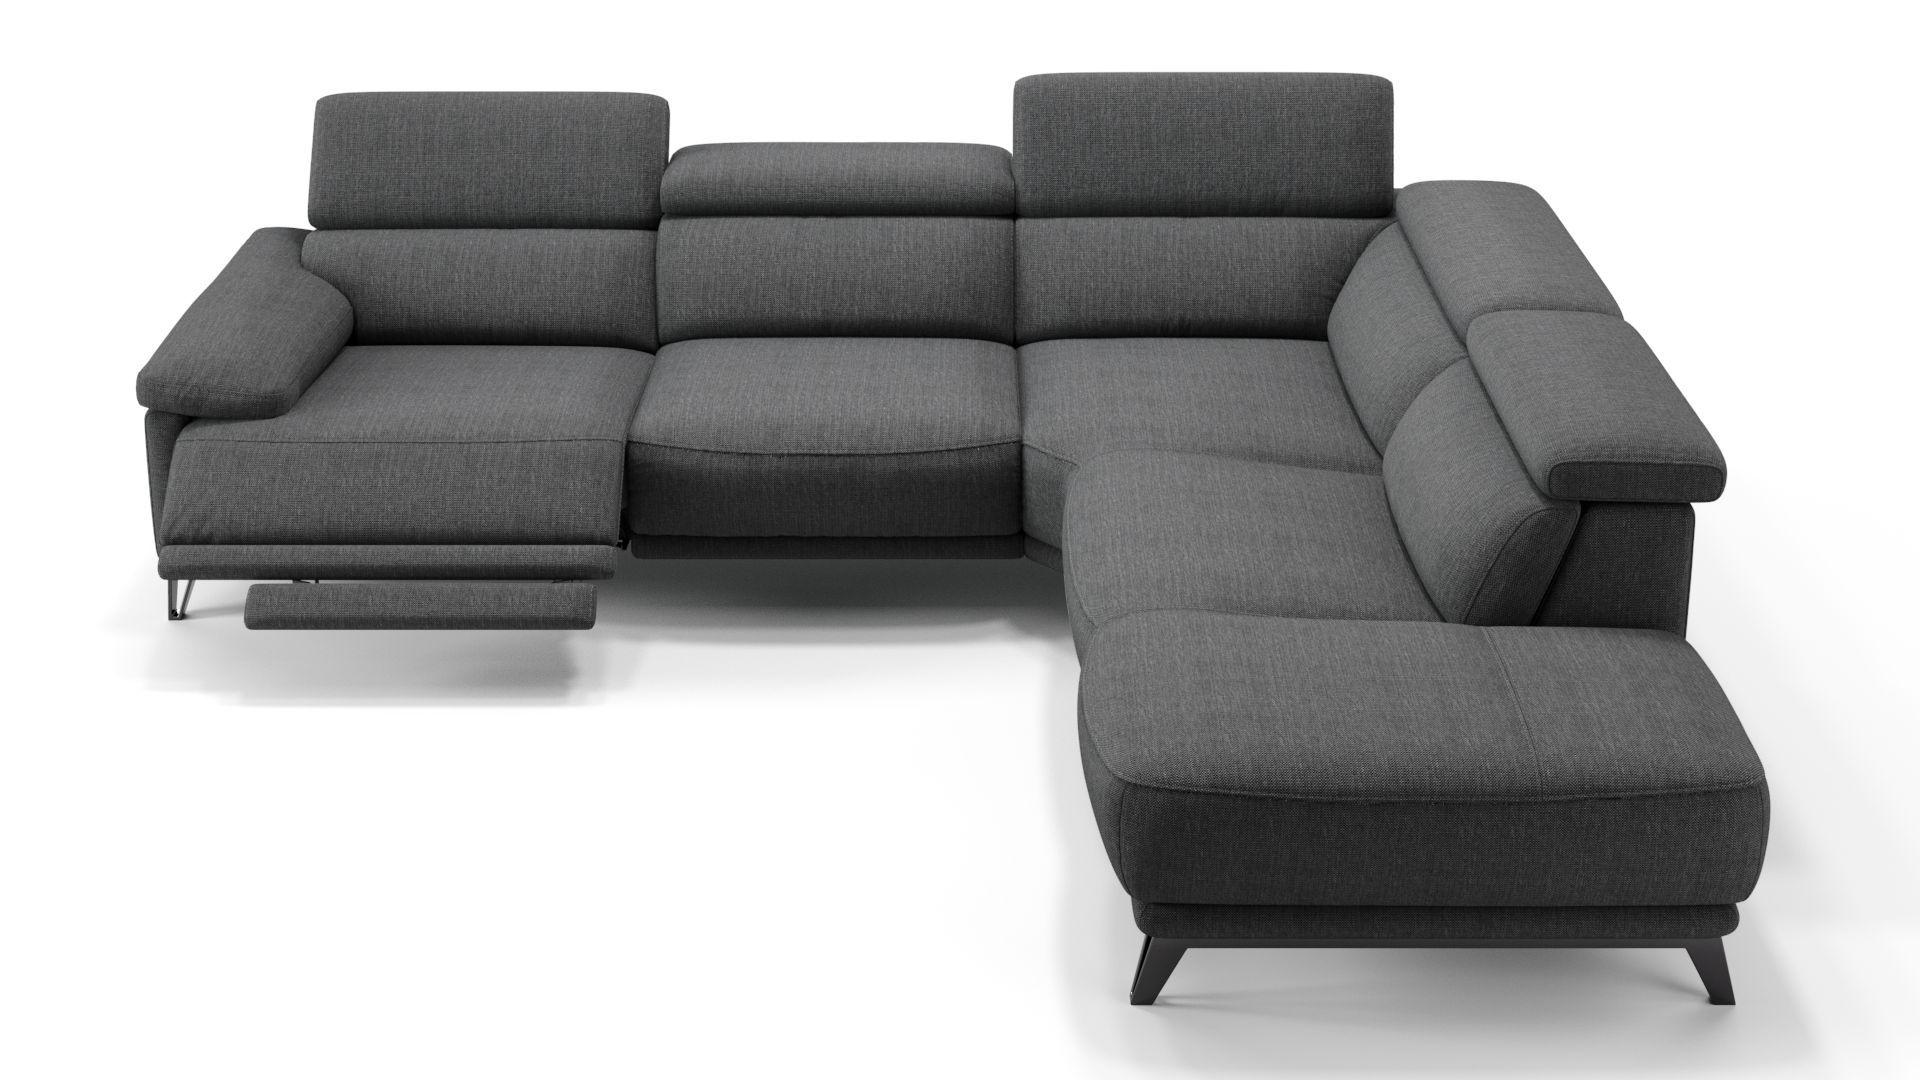 Celano Wohnlandschaft Sofa Mit Relaxfunktion Sofa Ecksofa